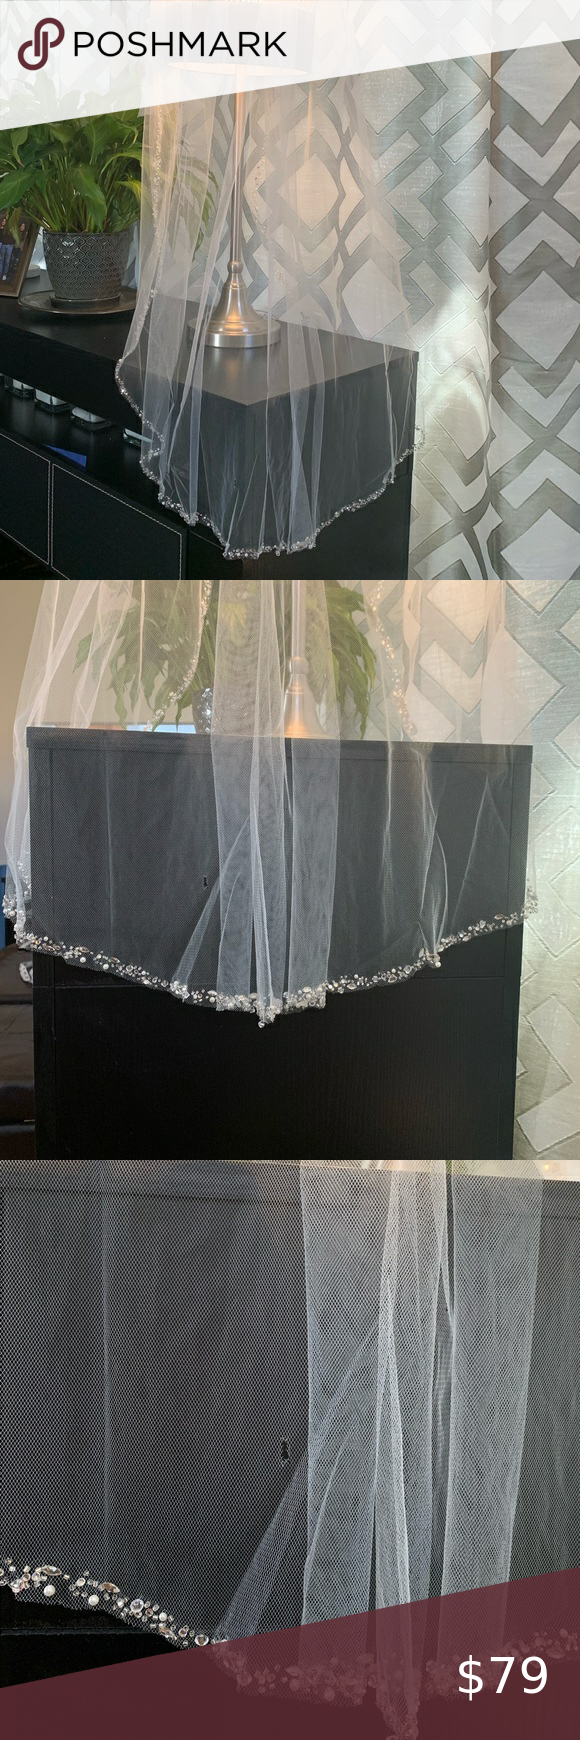 Fingertip Bridal Veil Comb Beaded Wedding Veil Beaded Wedding Veils Beaded Wedding Bridal Veil Combs